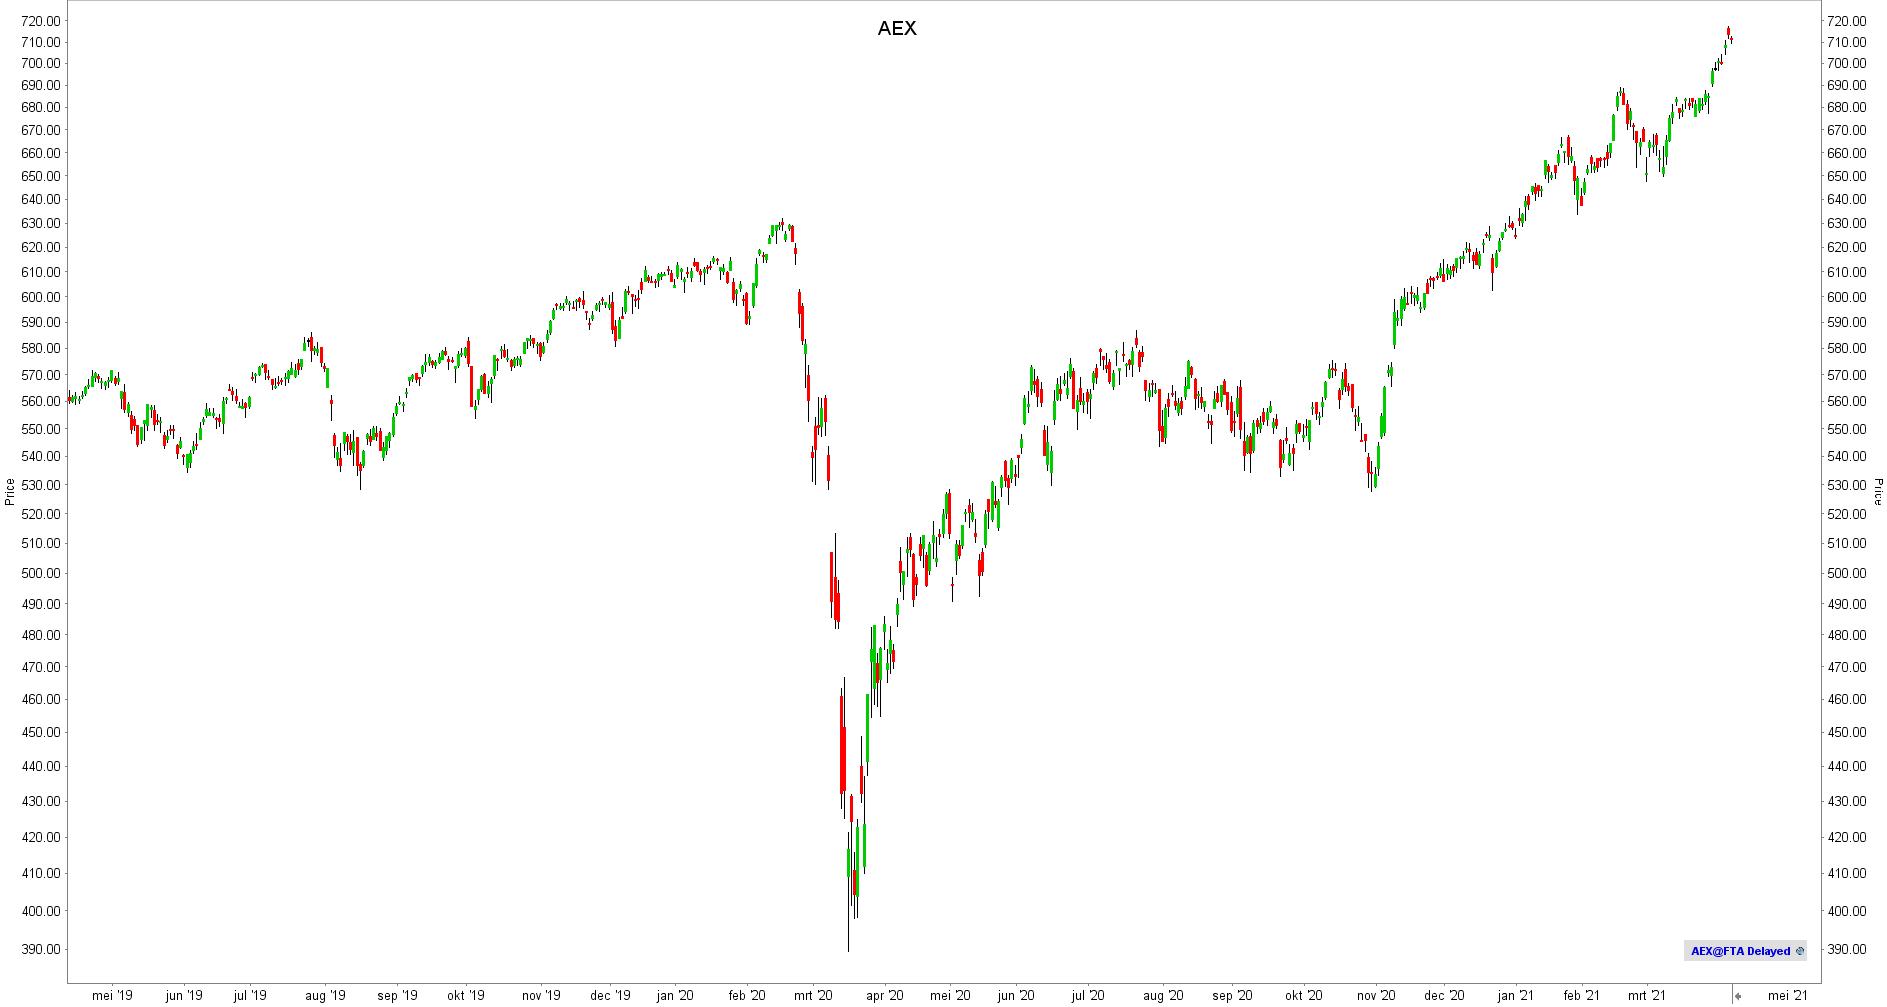 BEL20-index | AEX-index | Overzicht BEL20 | Overzicht bel20 | Overzicht AEX